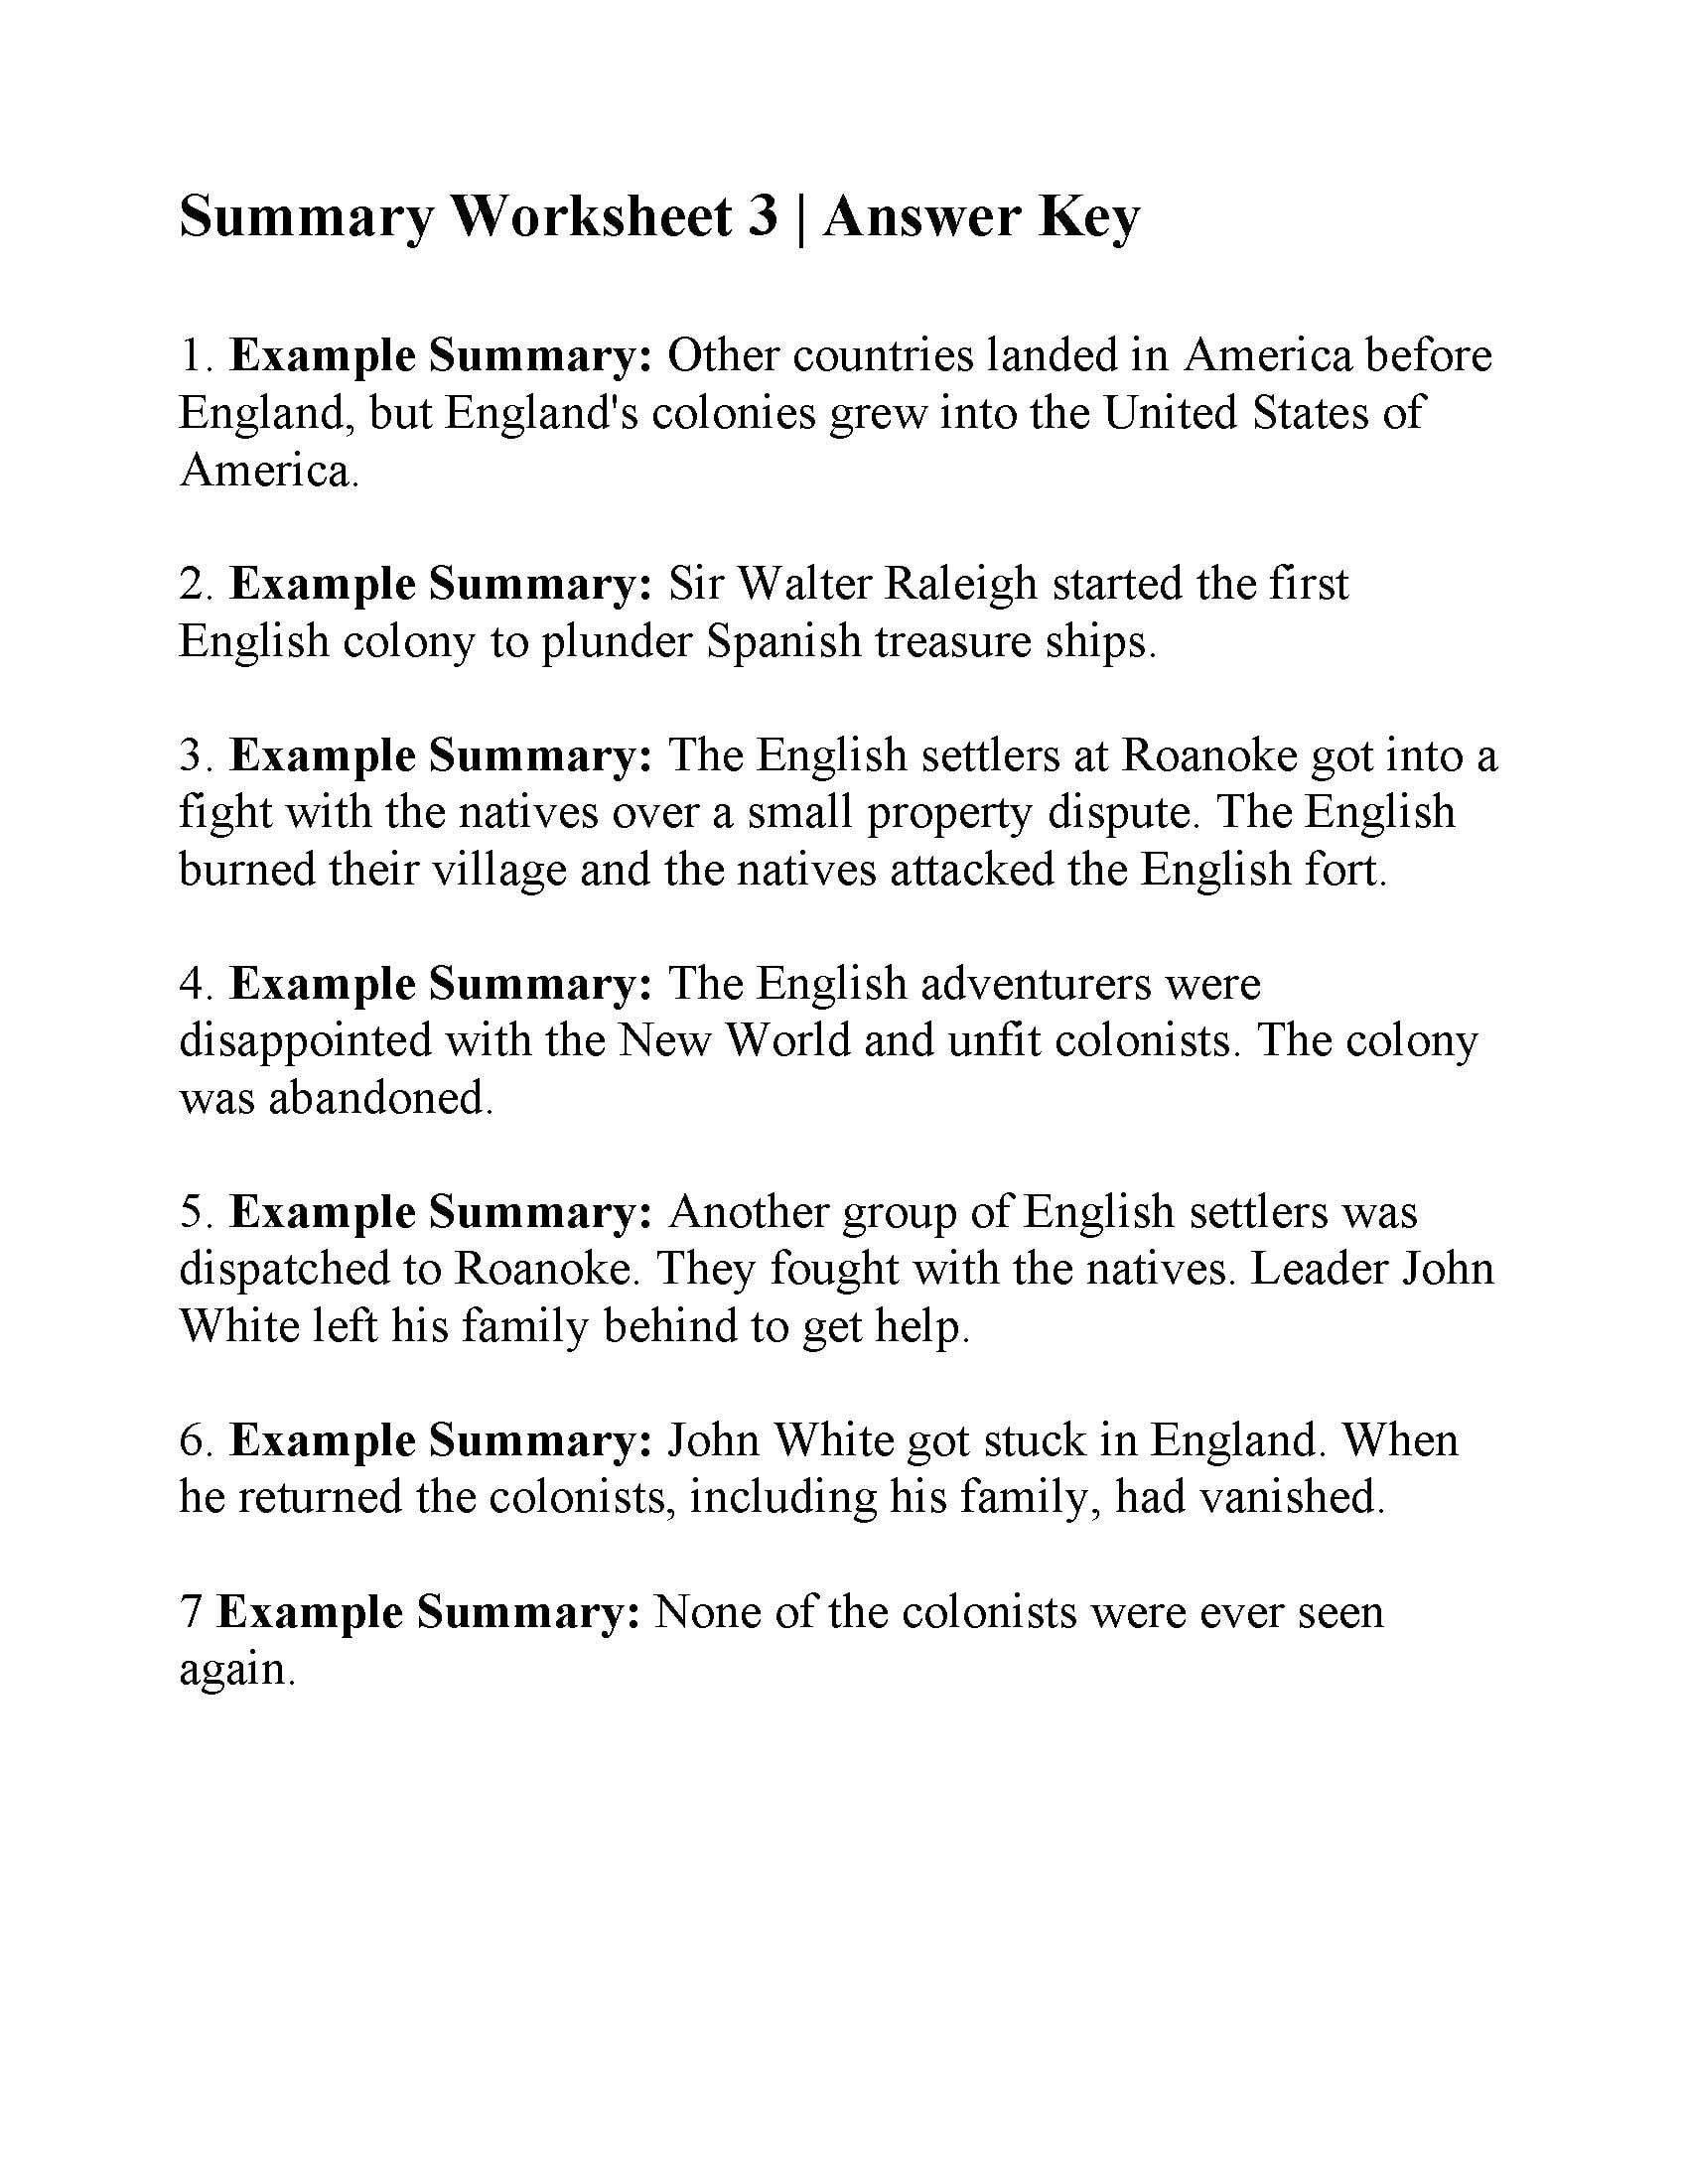 Summarizing Worksheet 3rd Grade 3 Reading Comprehension 5th Worksheets Paraphrasing And Practice Pdf